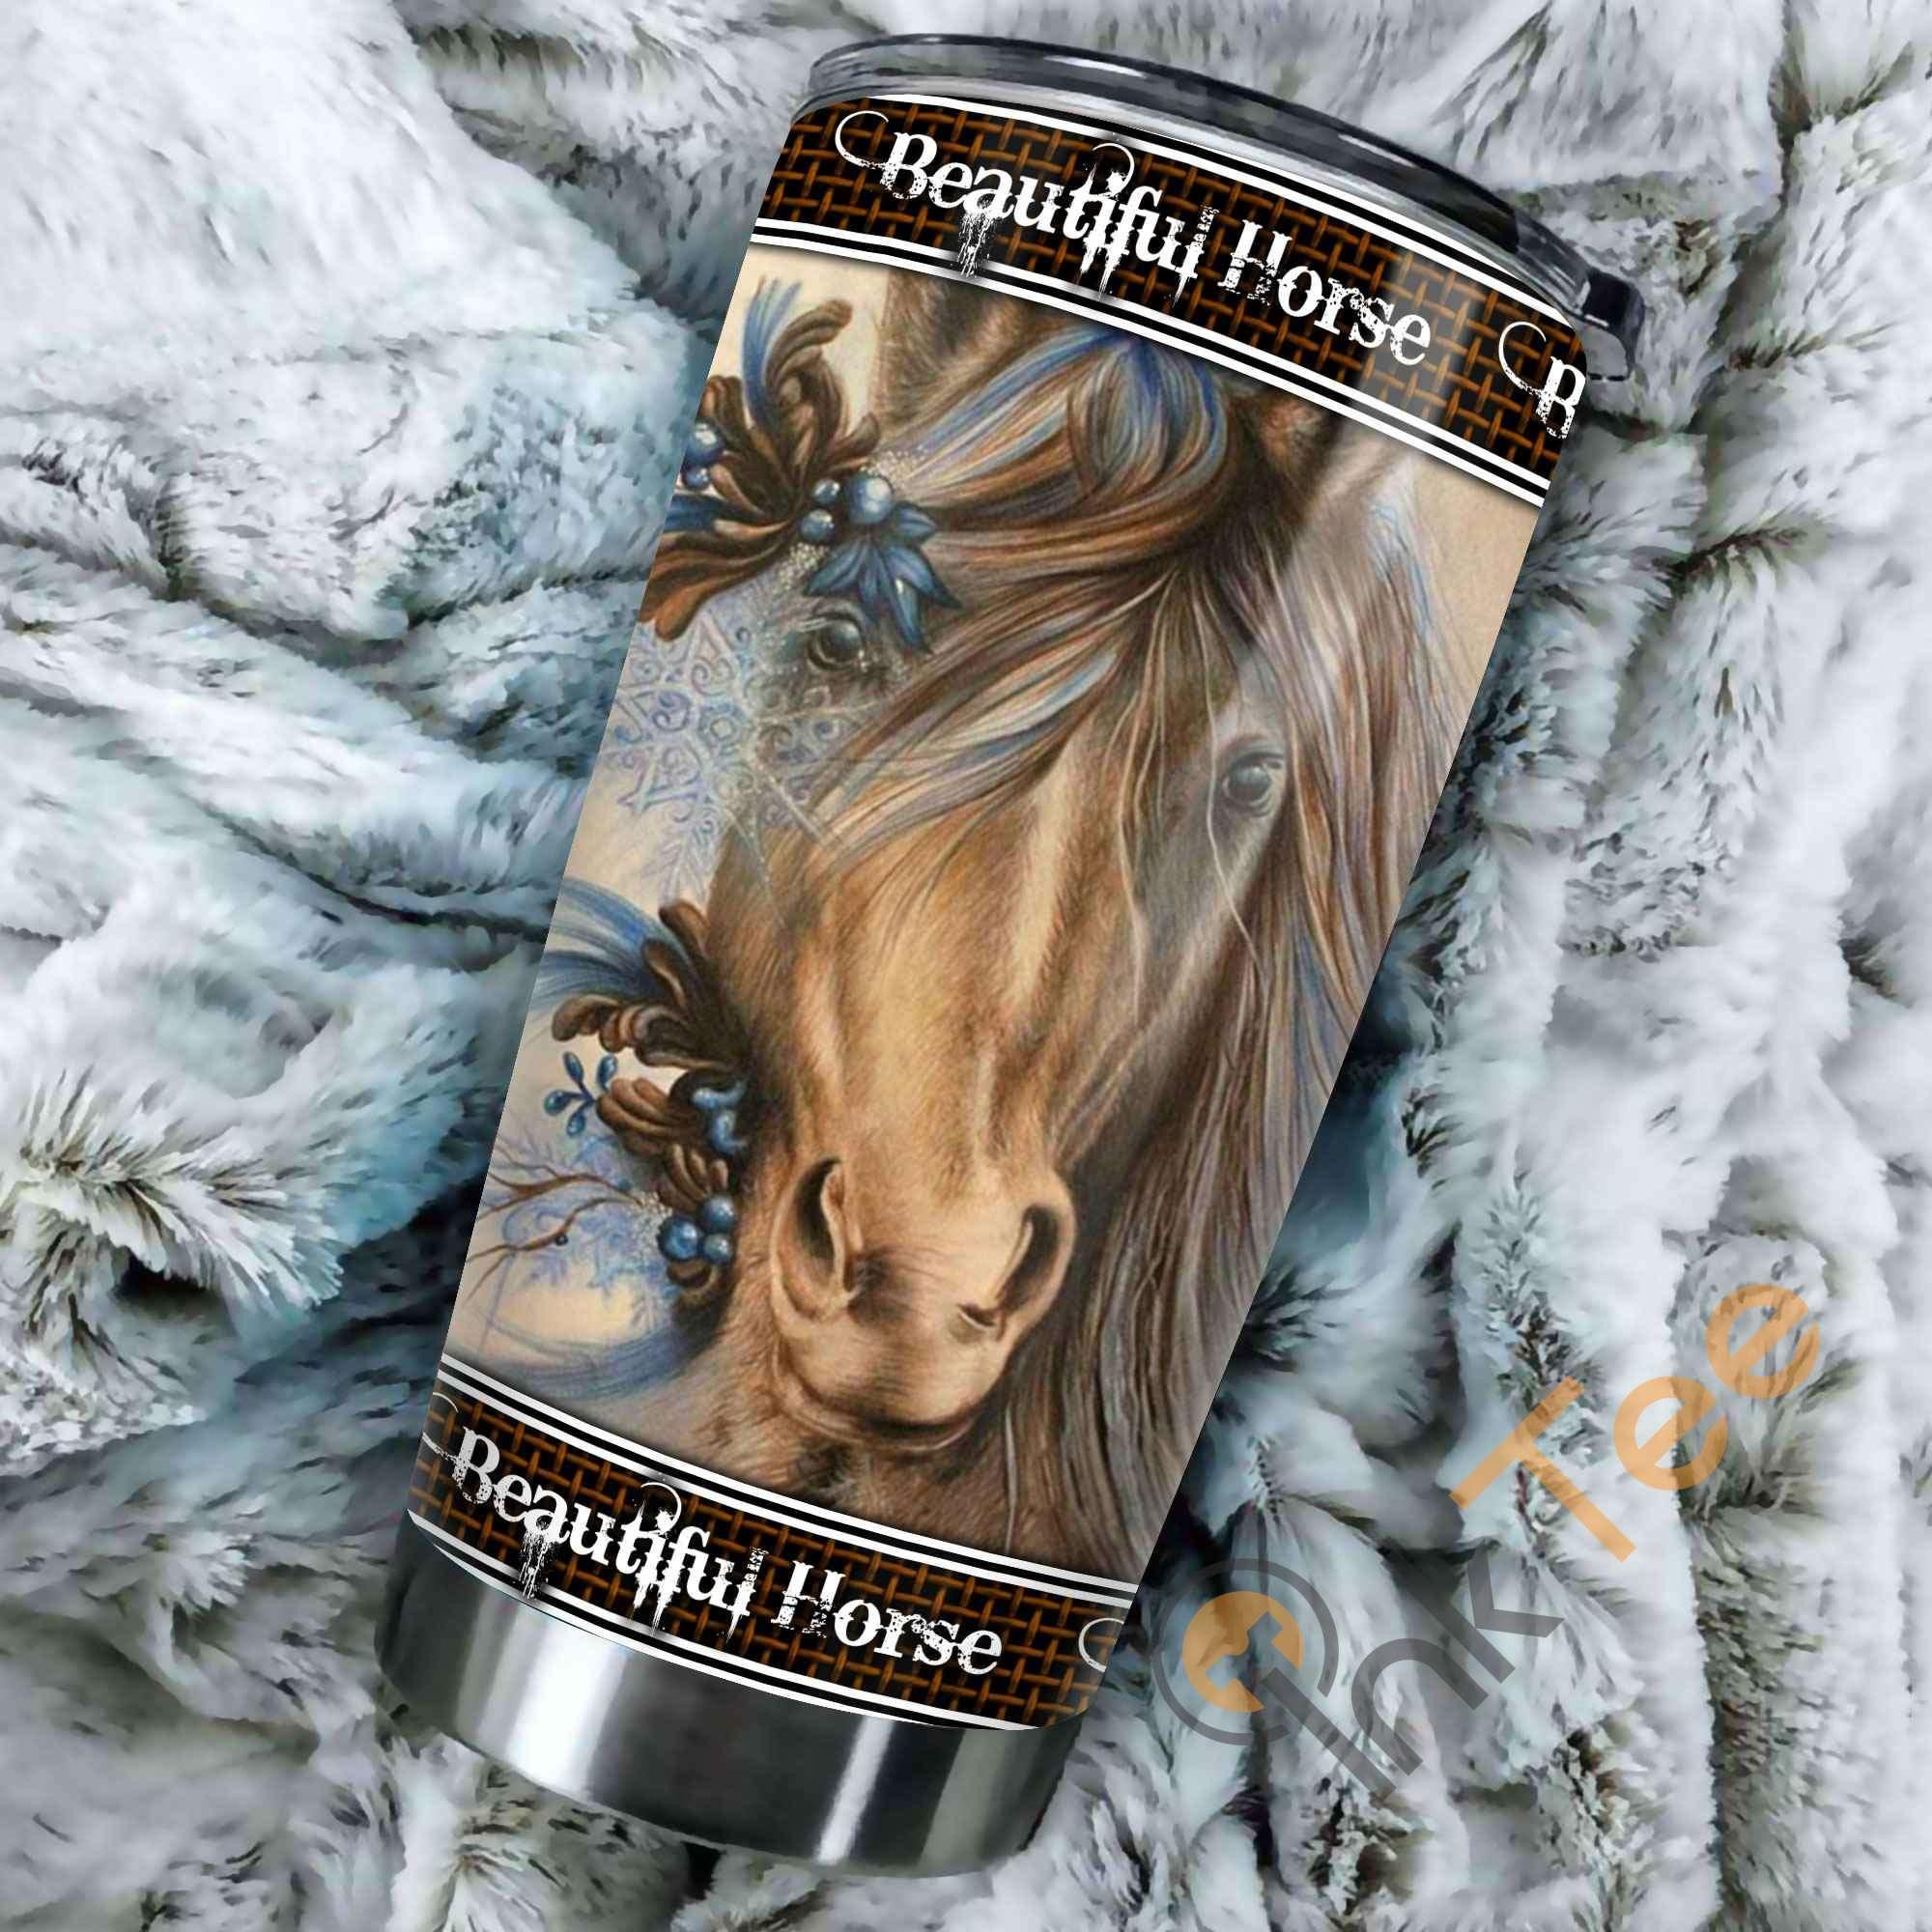 Beautiful Horse Amazon Best Seller Sku 3175 Stainless Steel Tumbler